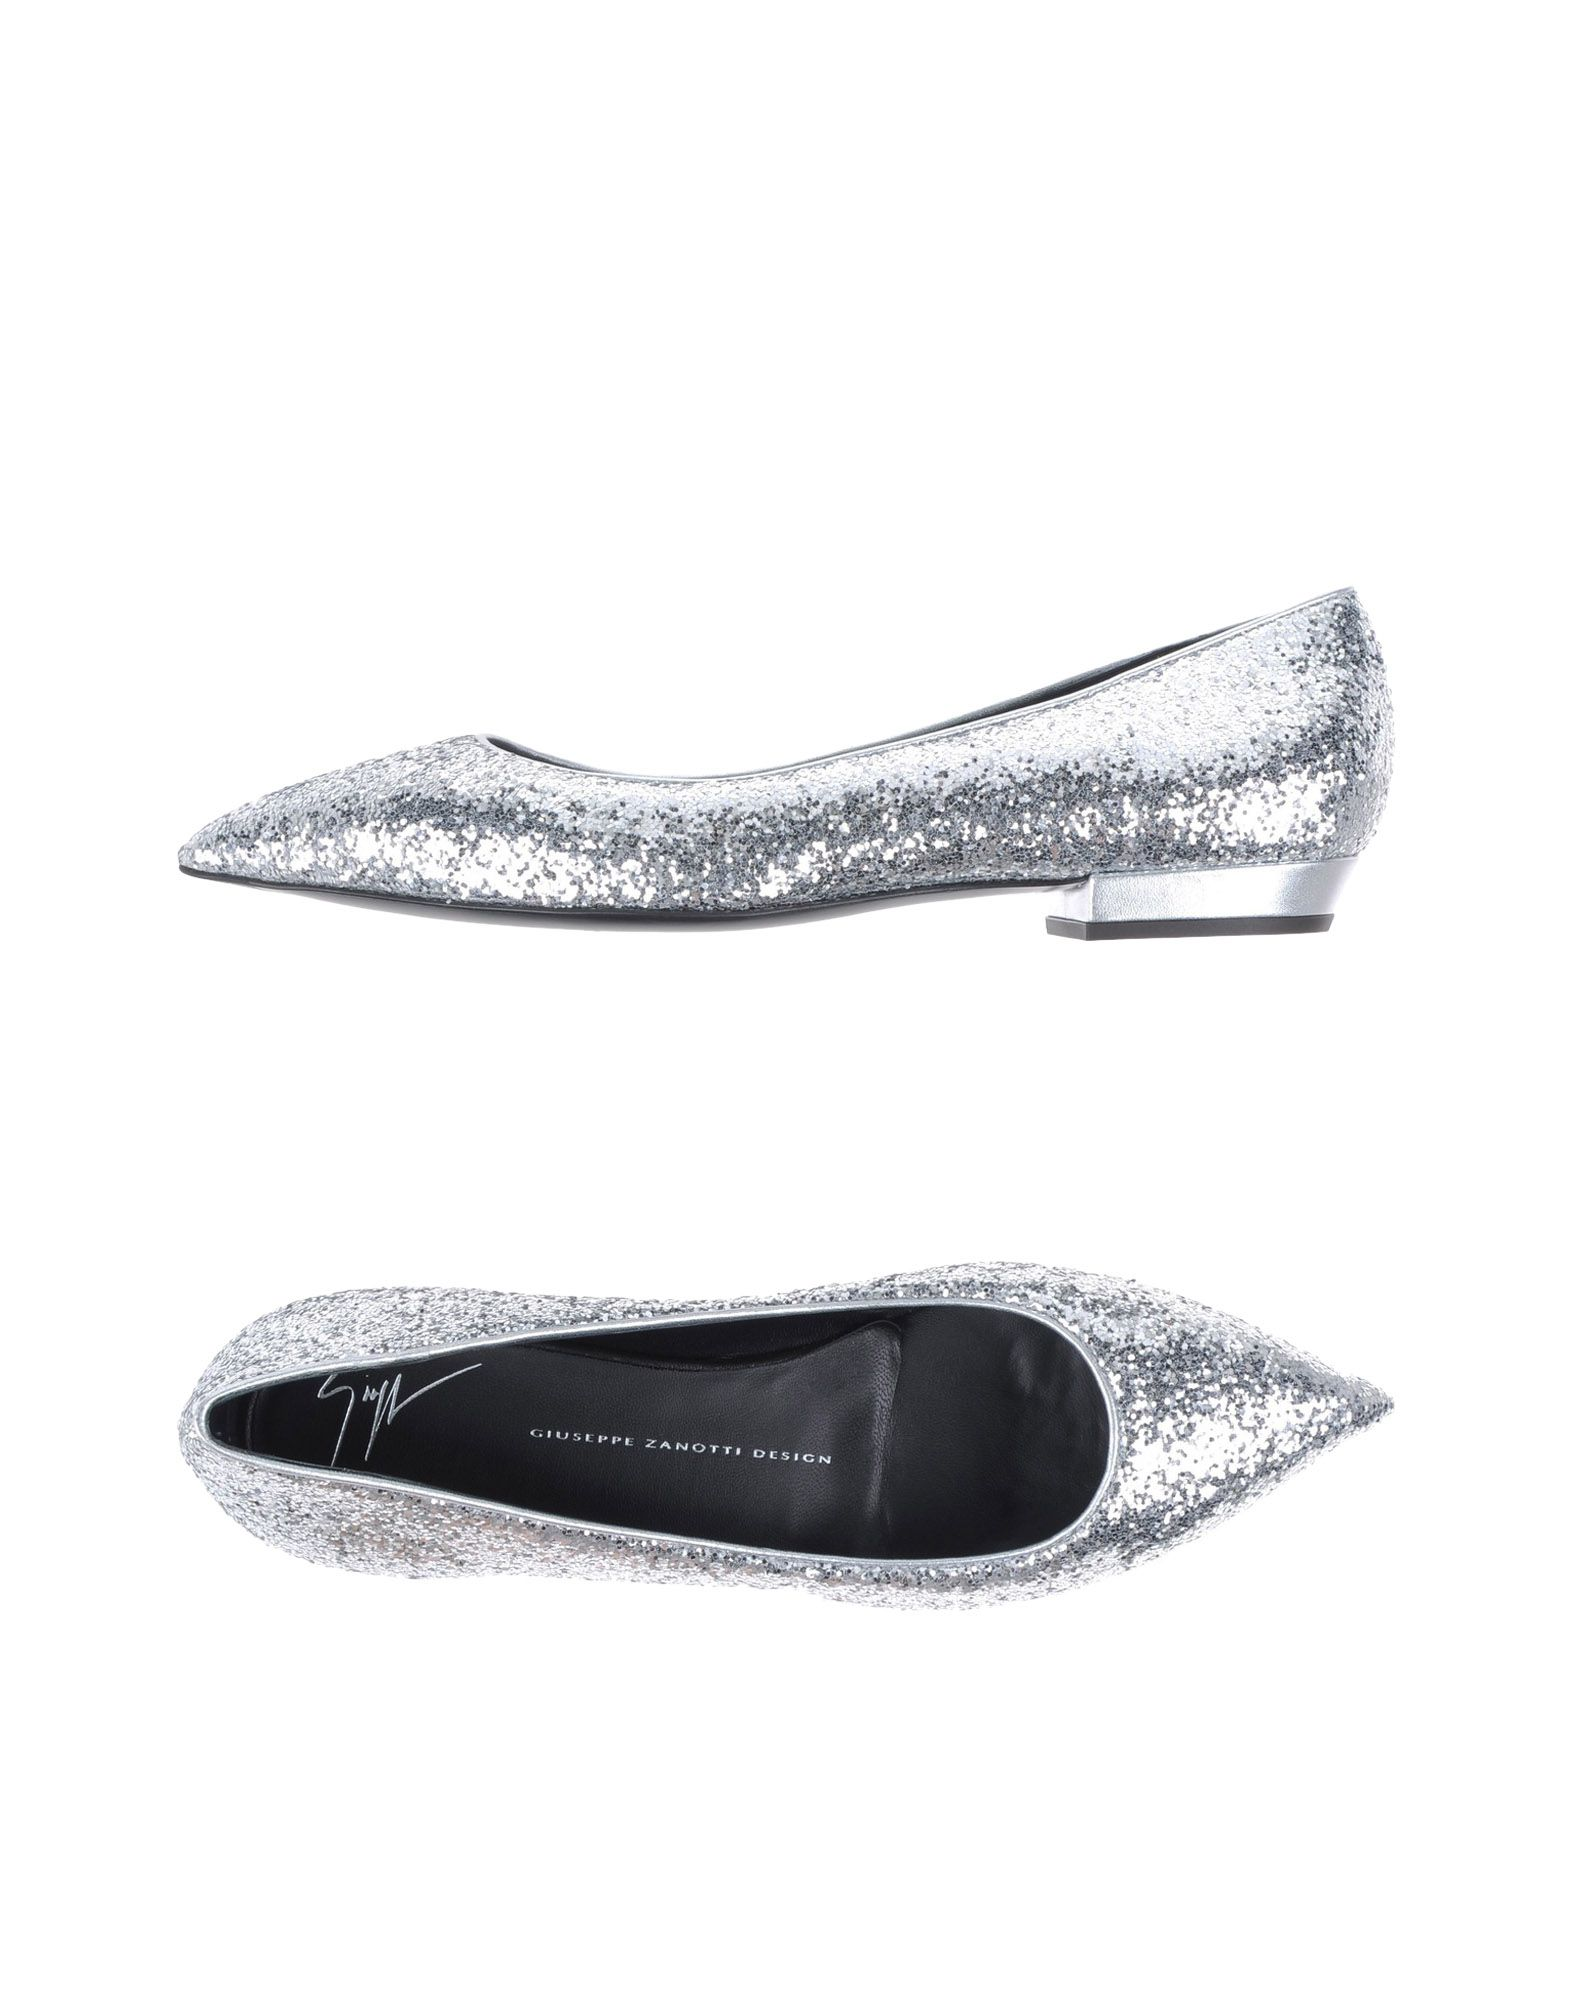 Giuseppe Zanotti Ballet Flats Ballet - Women Giuseppe Zanotti Ballet Flats Flats online on  Australia - 44940434RO 1153c0